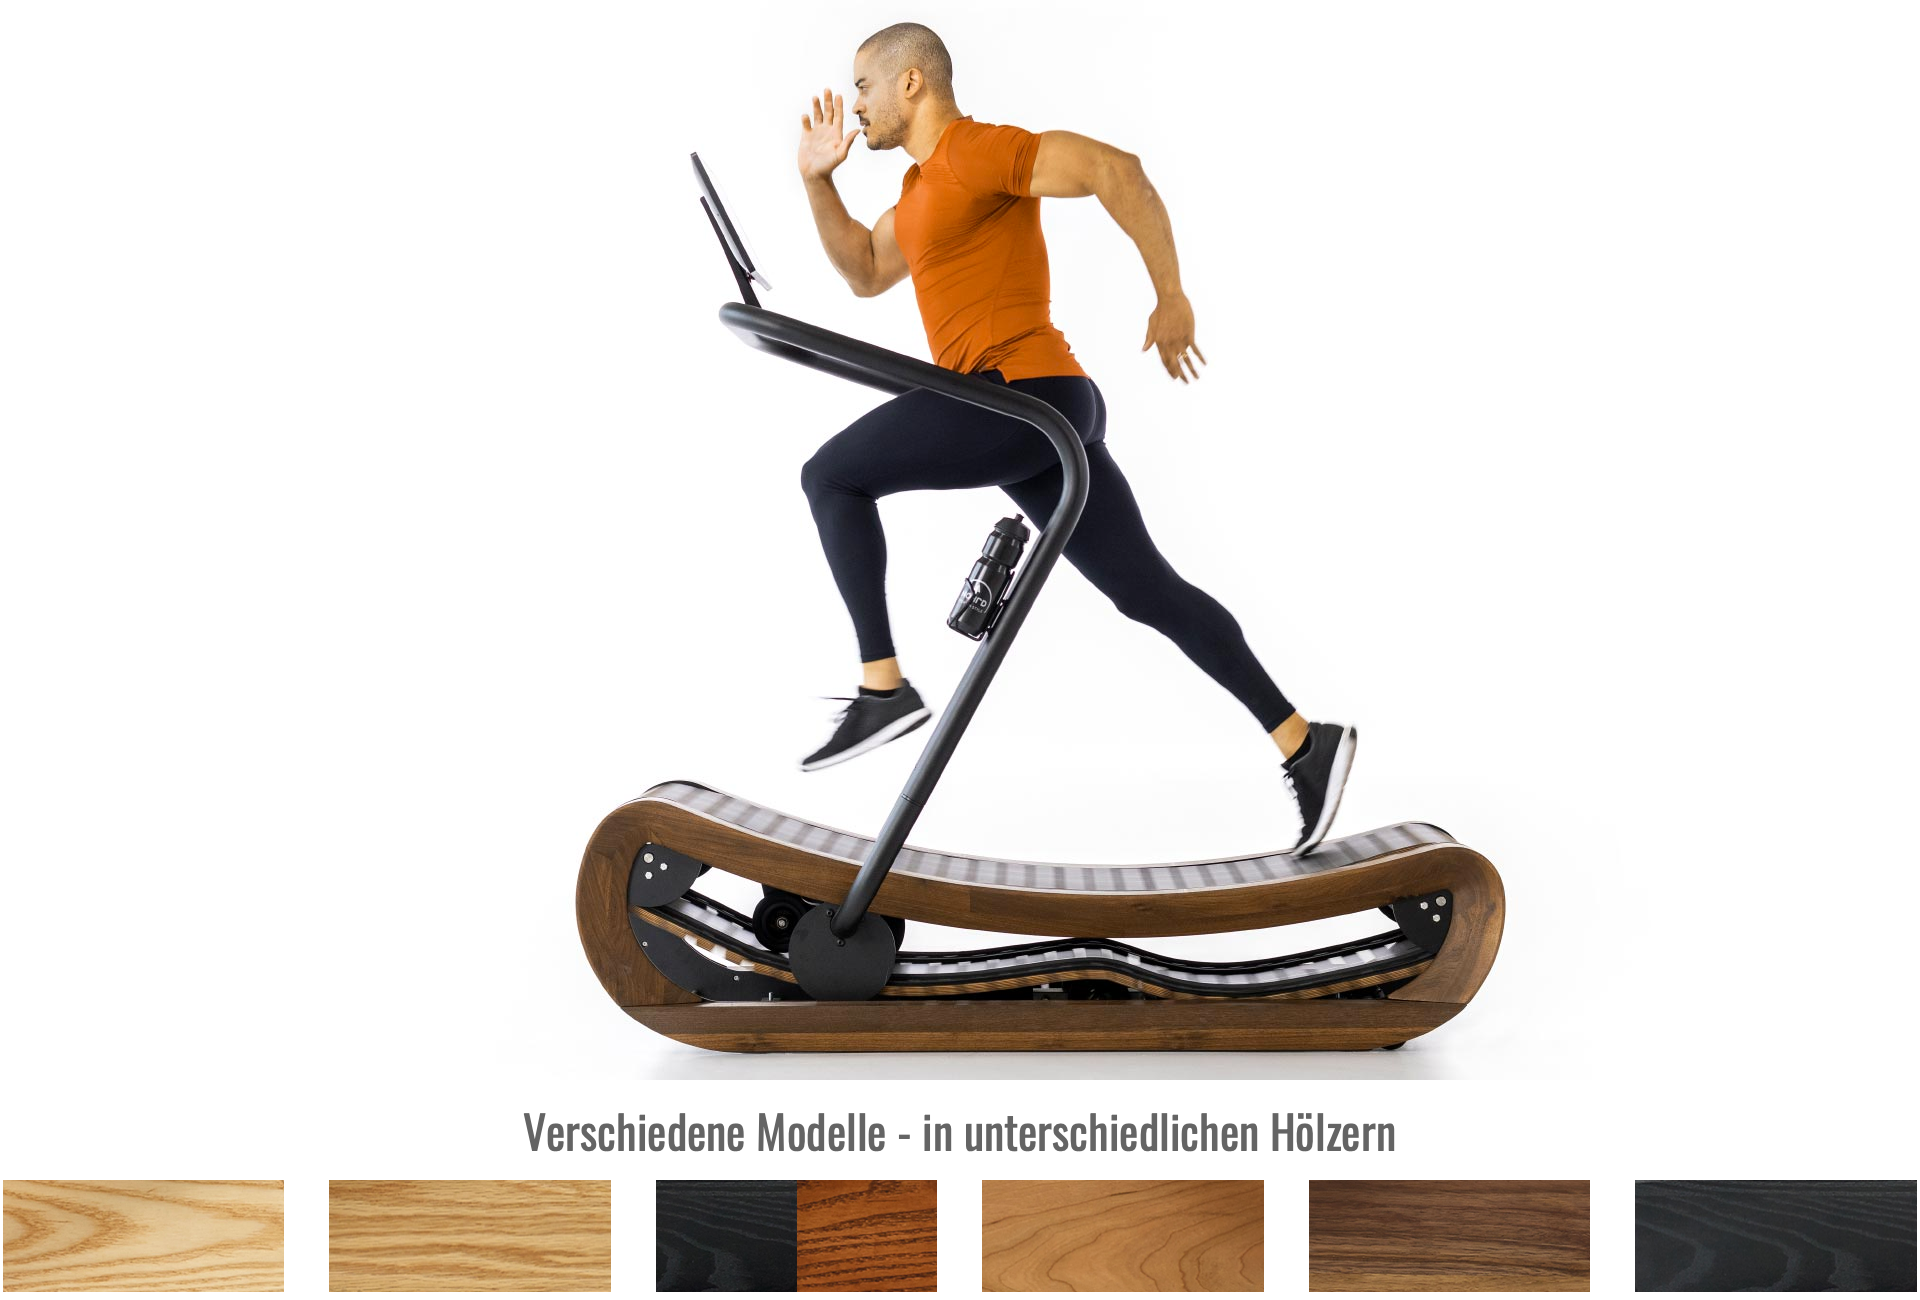 2-Holzmodelle-Farben-Springbok-Laufband